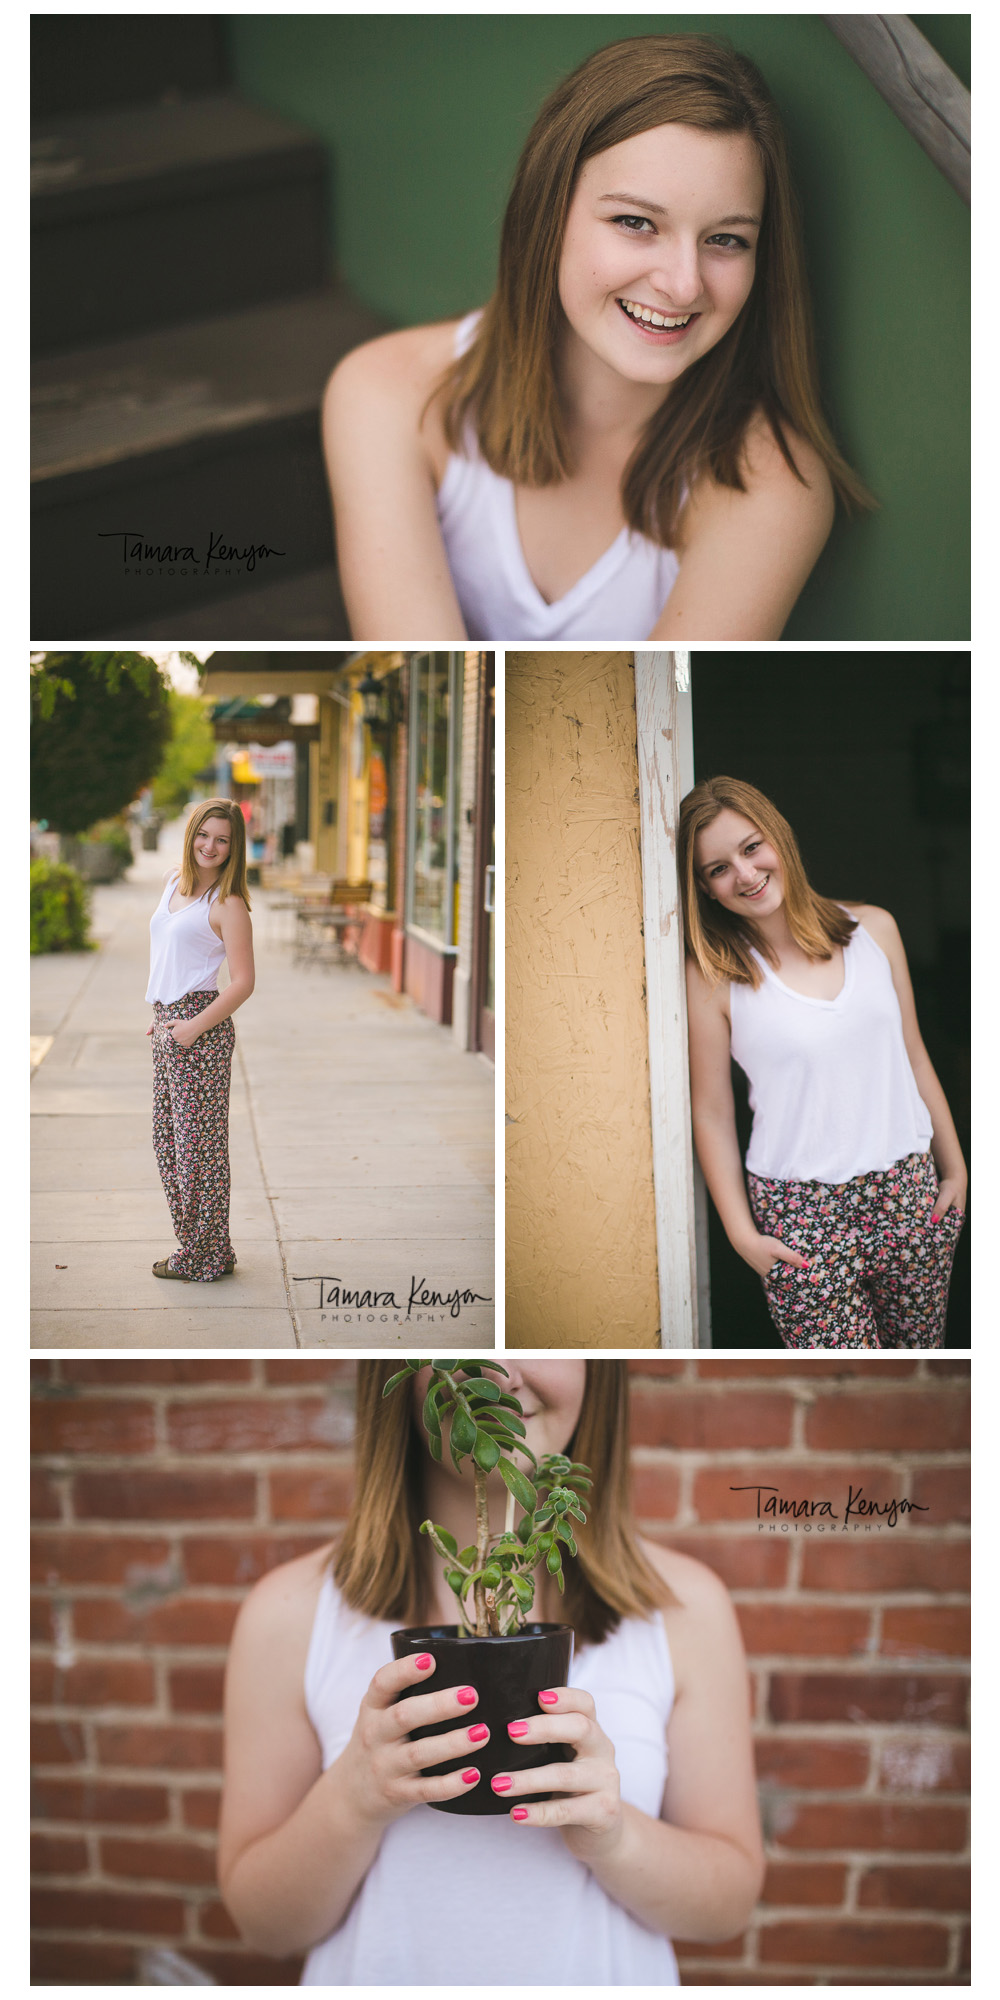 Urban_High_School_Senior_Portraits.jpg